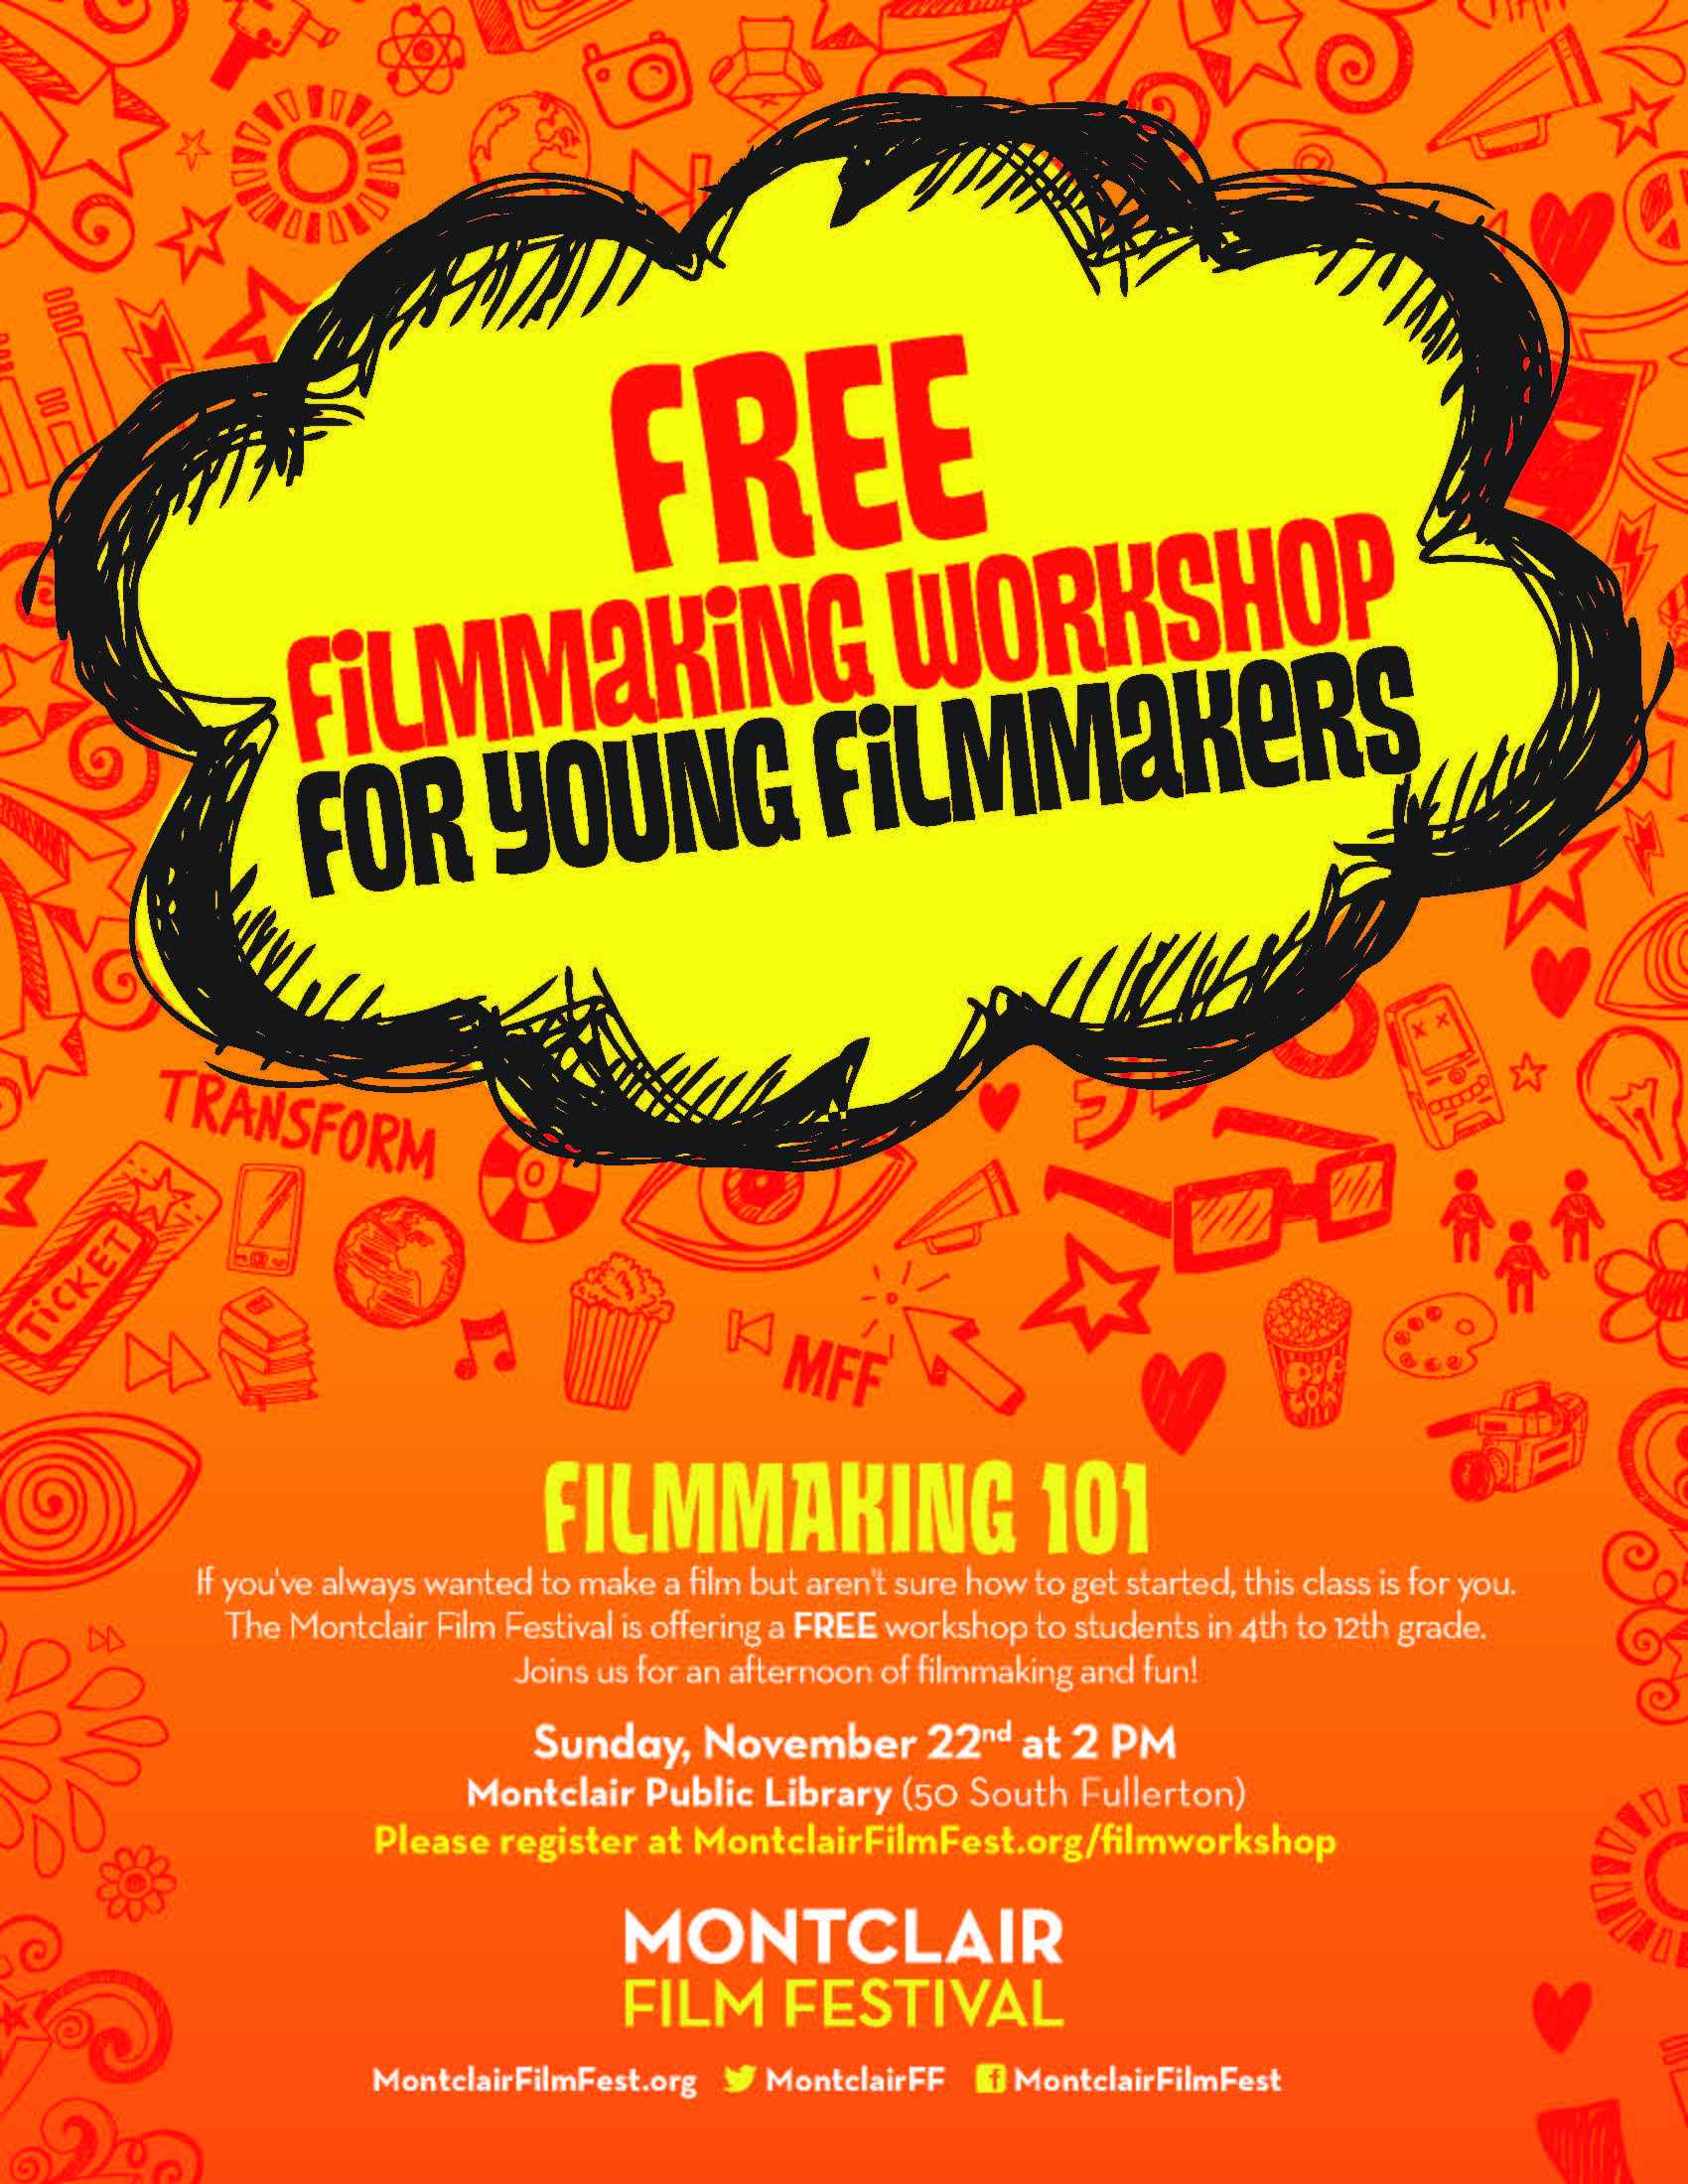 Free Filmmaking Workshop Montclair Film